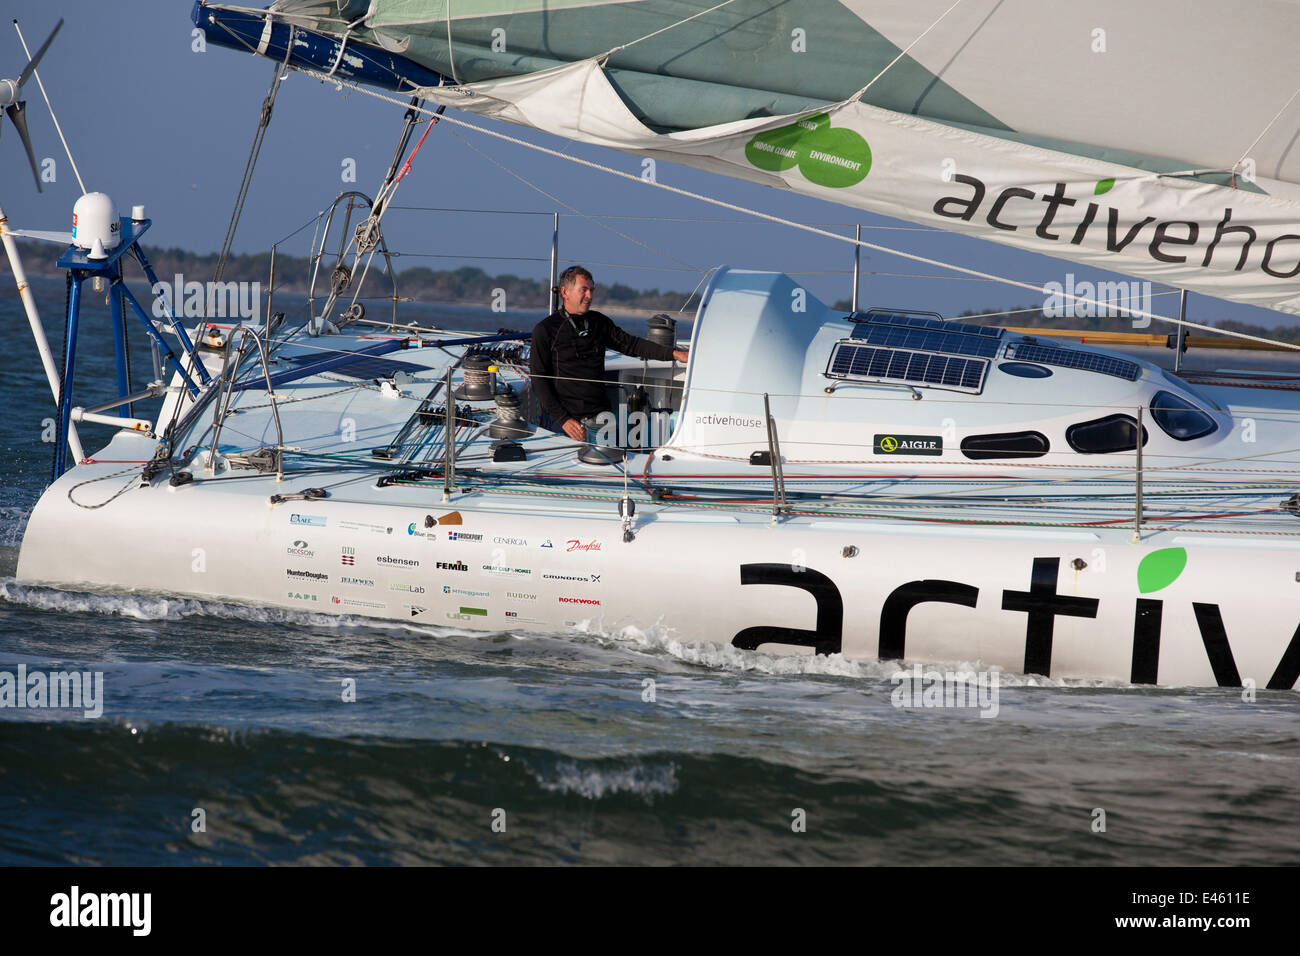 Skipper Derek Hatfield On Board Active House Finishing Sprint - All 5 oceans